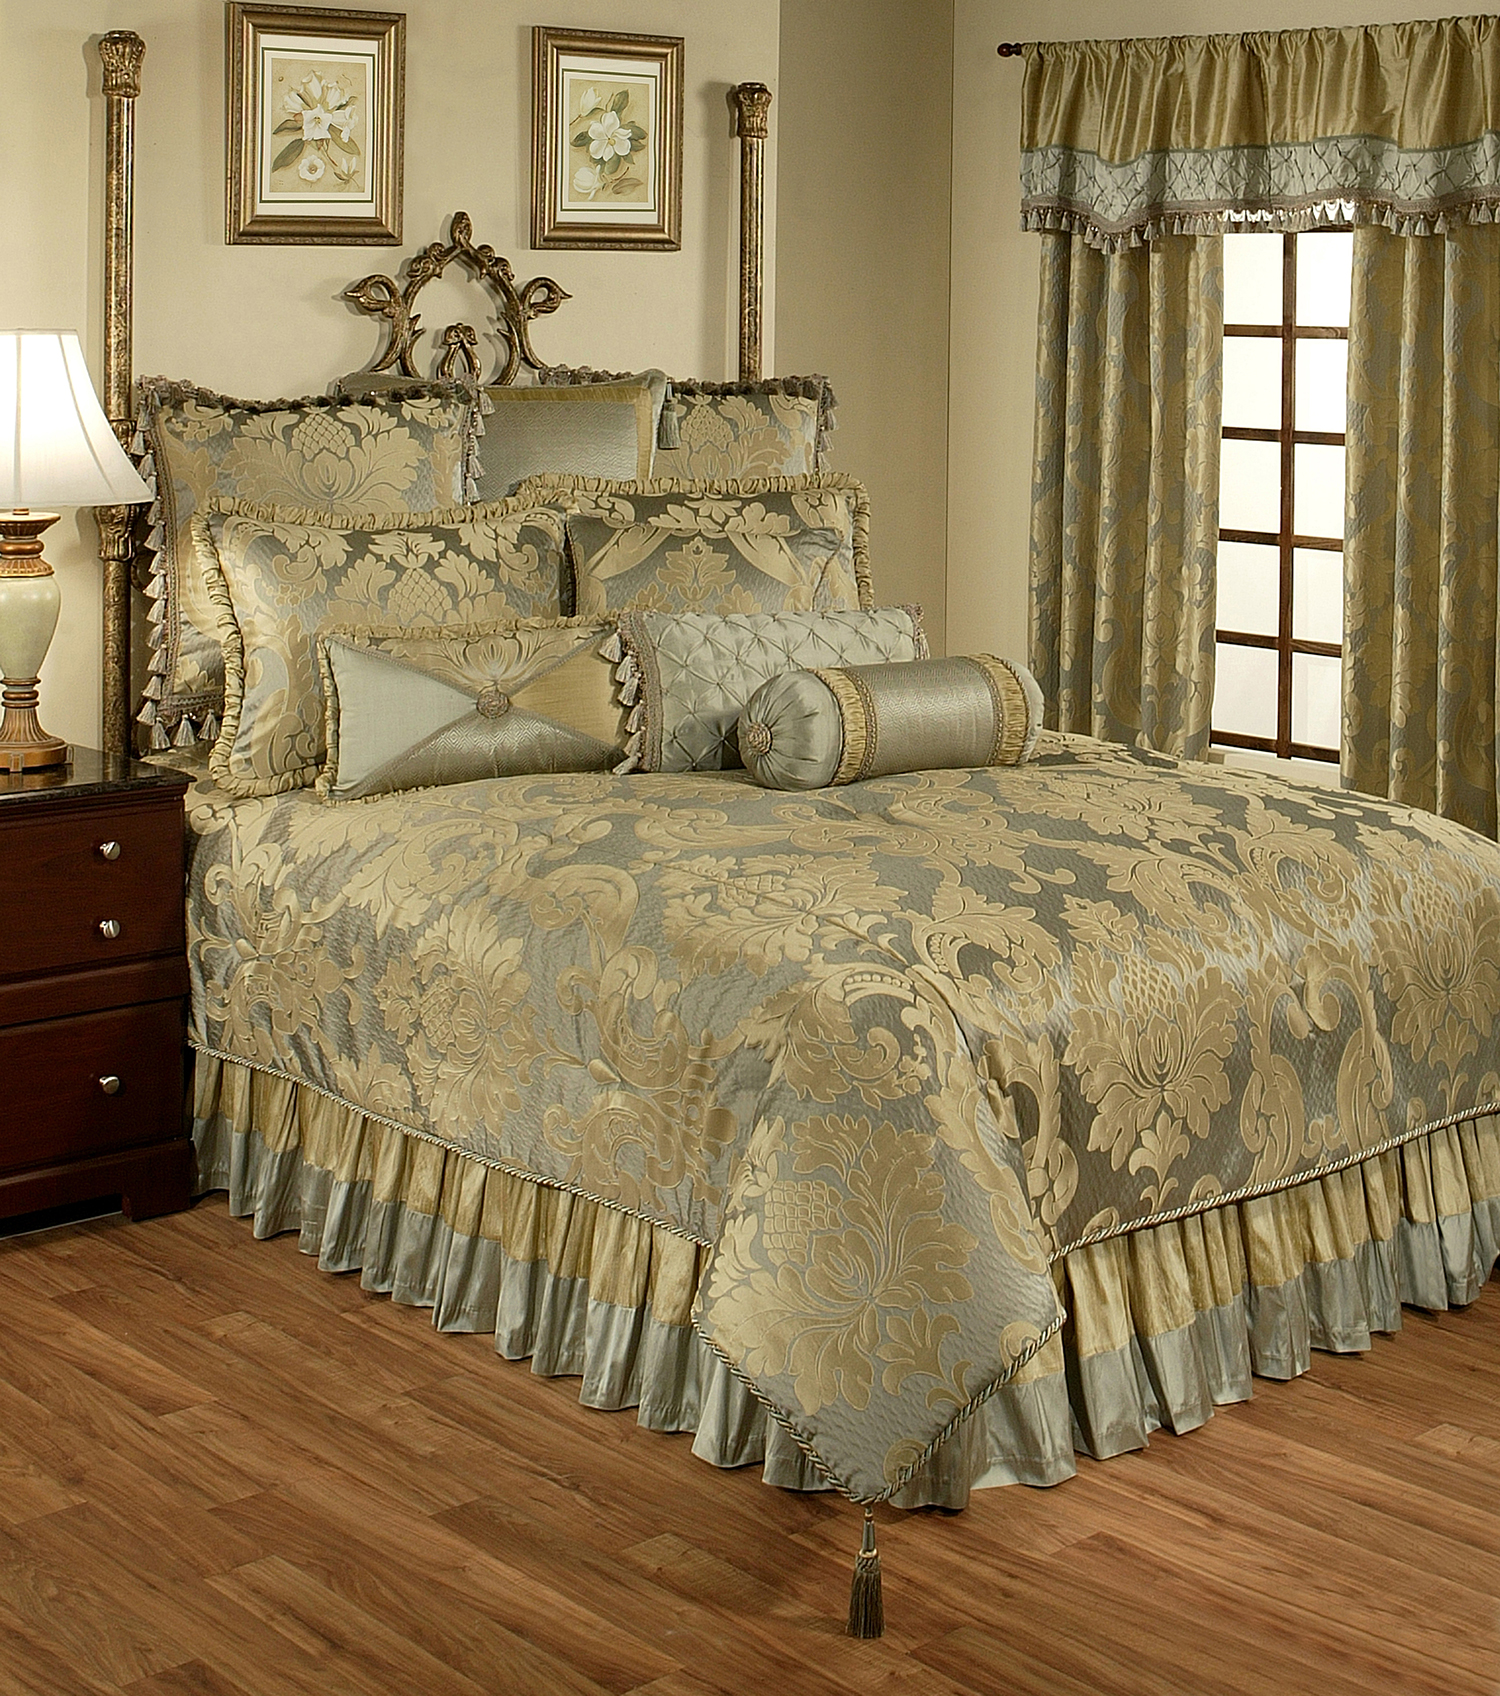 Duchess By Austin Horn Luxury Bedding Beddingsuperstore Com